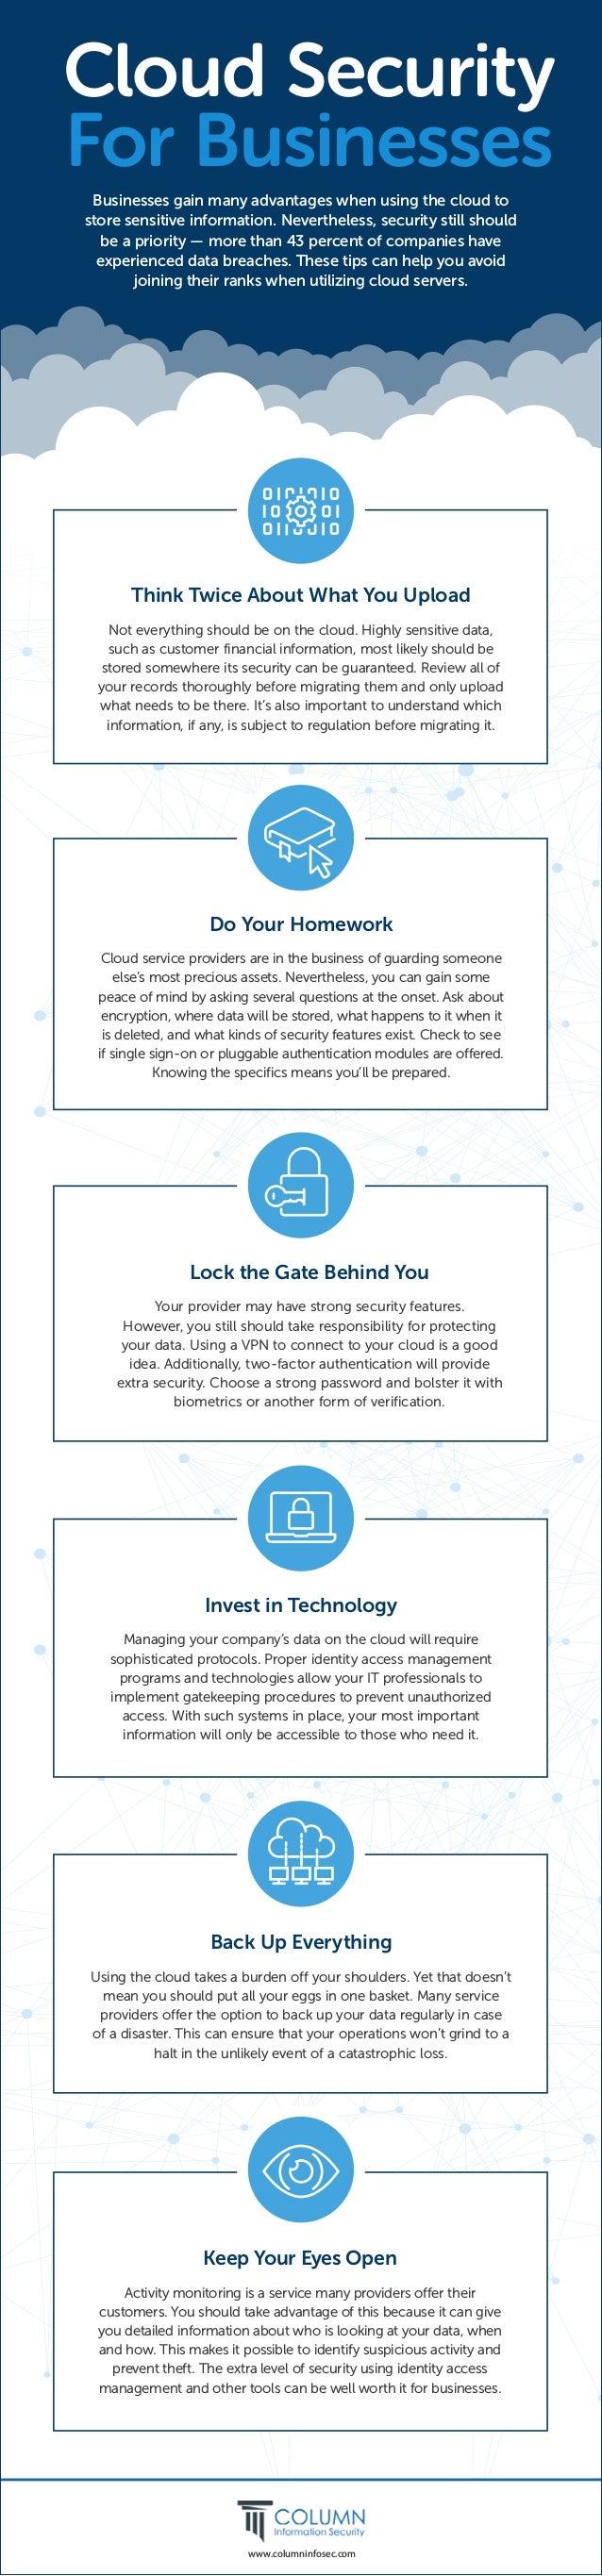 www.columninfosec.com Cloud Security For Businesses Businesses gain many advantages when using the cloud to store sensitiv...